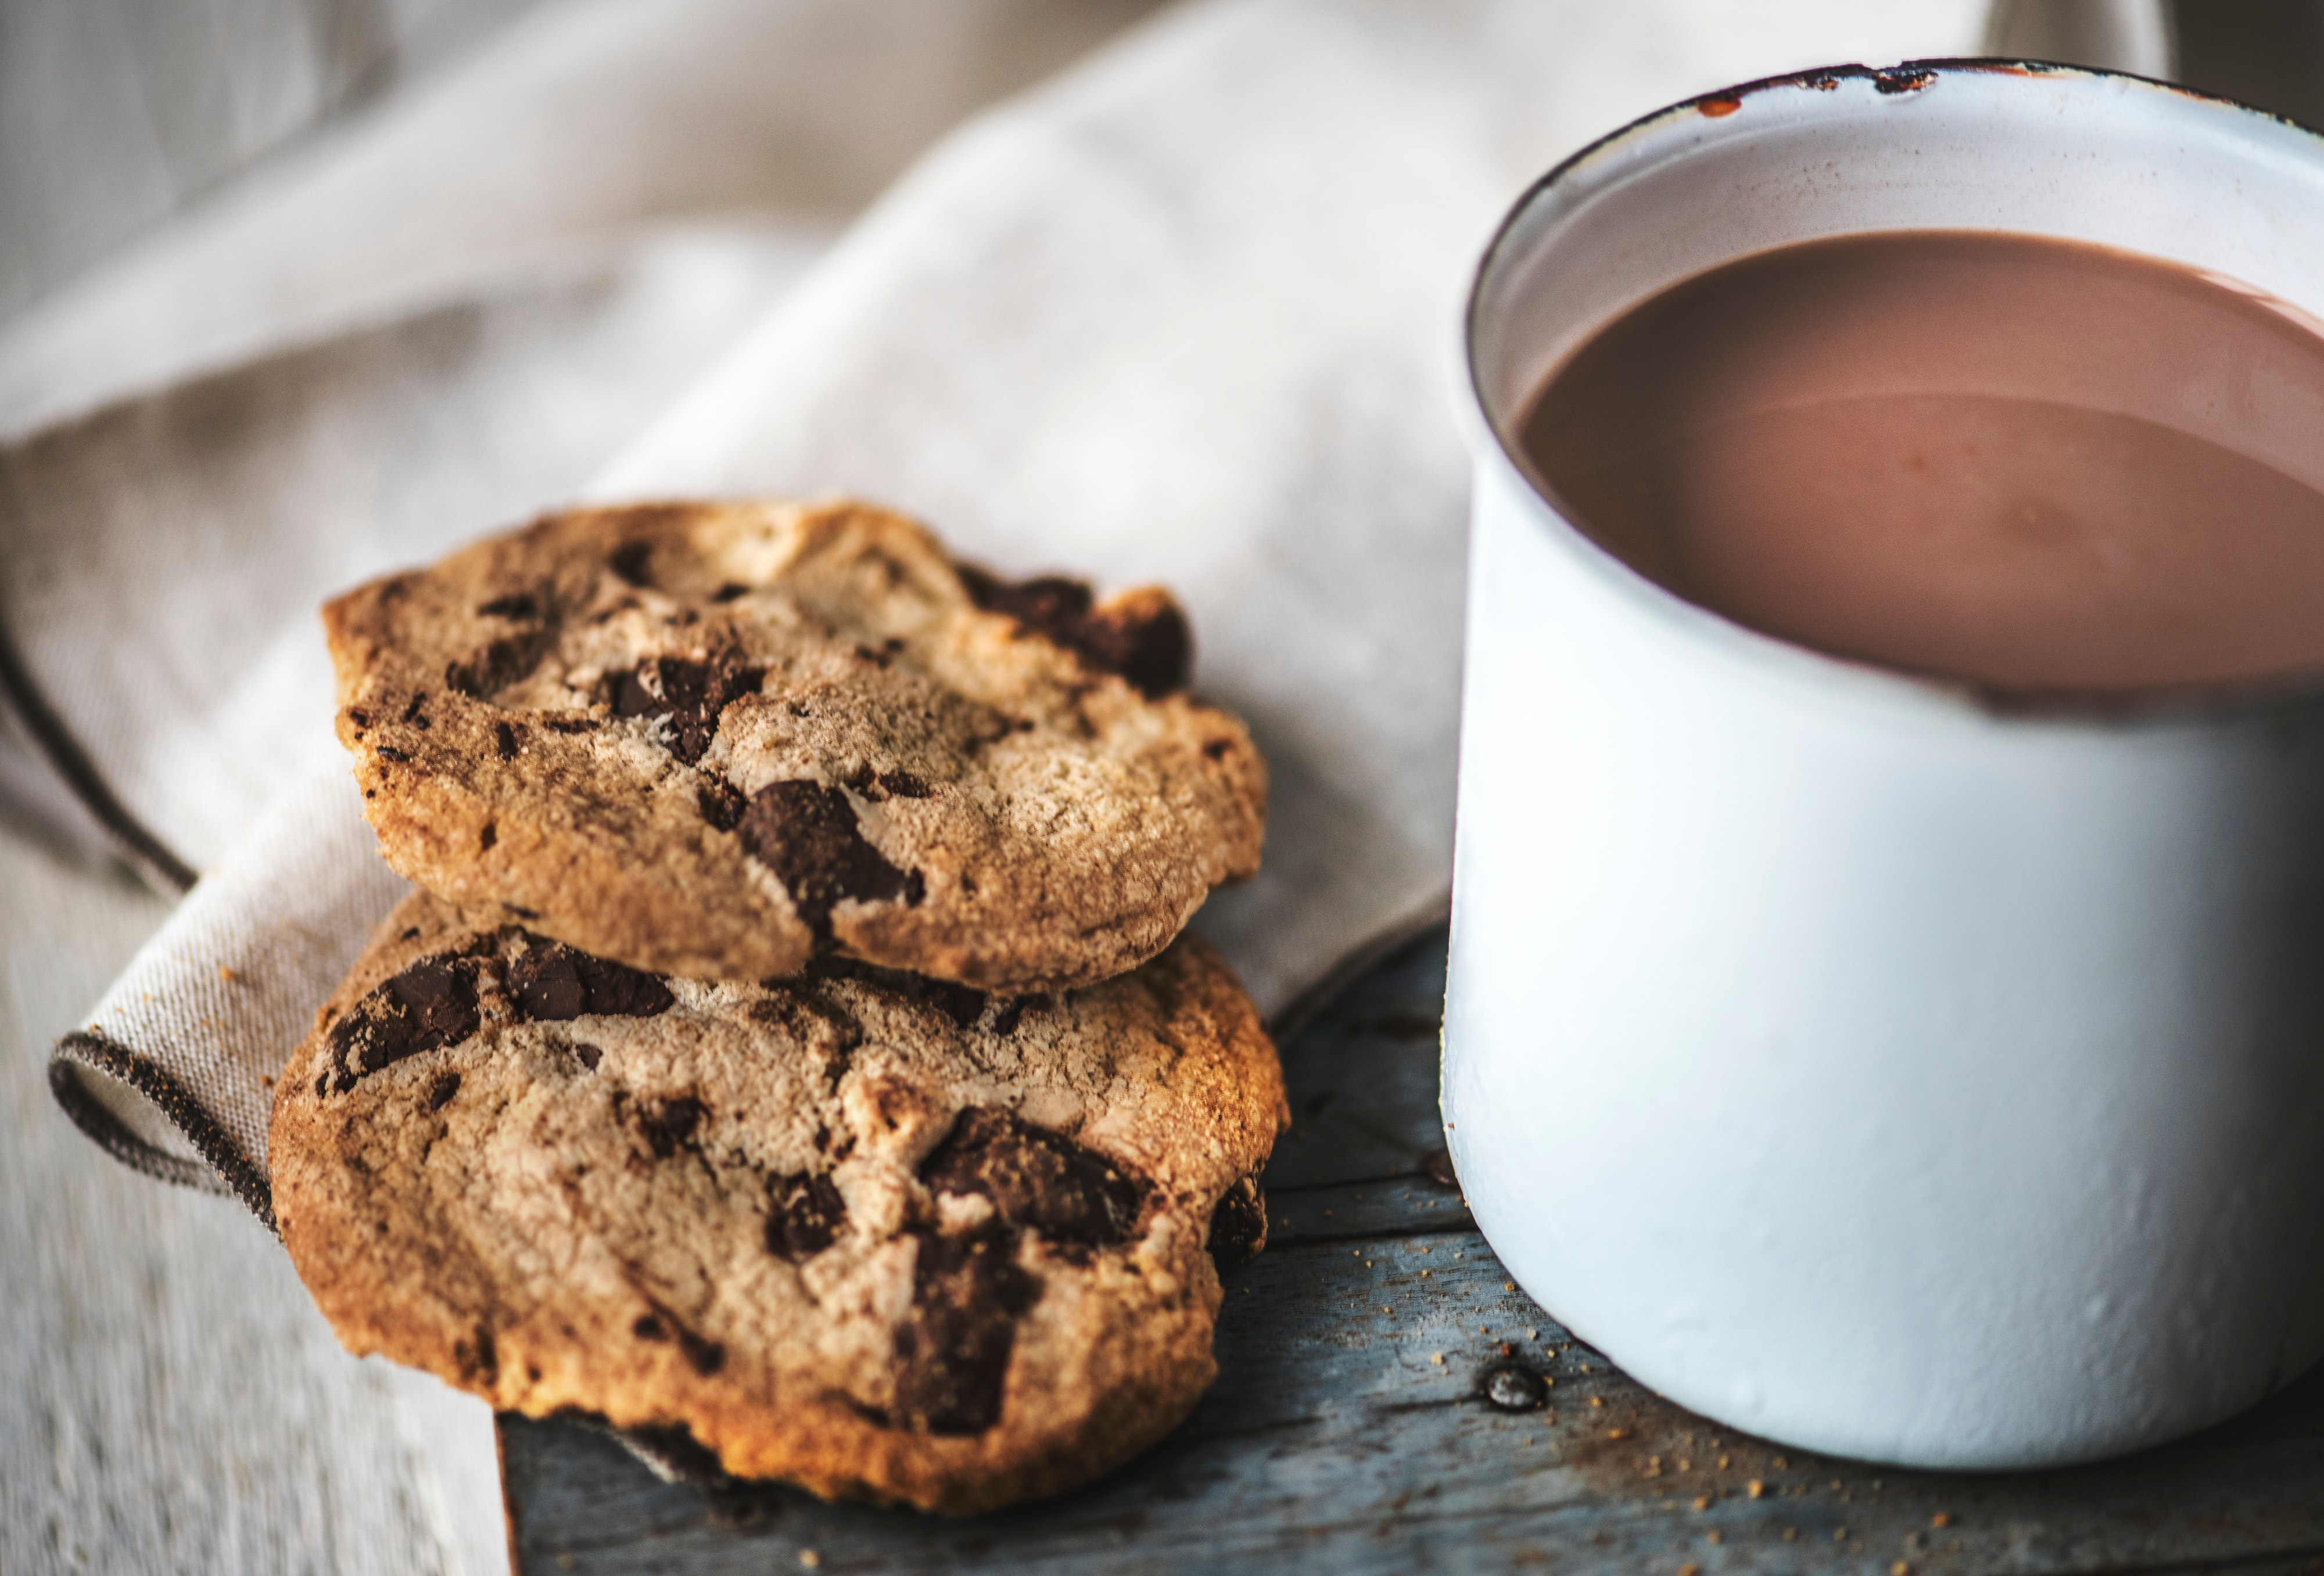 baked-beverage-biscuit-1331979.jpg